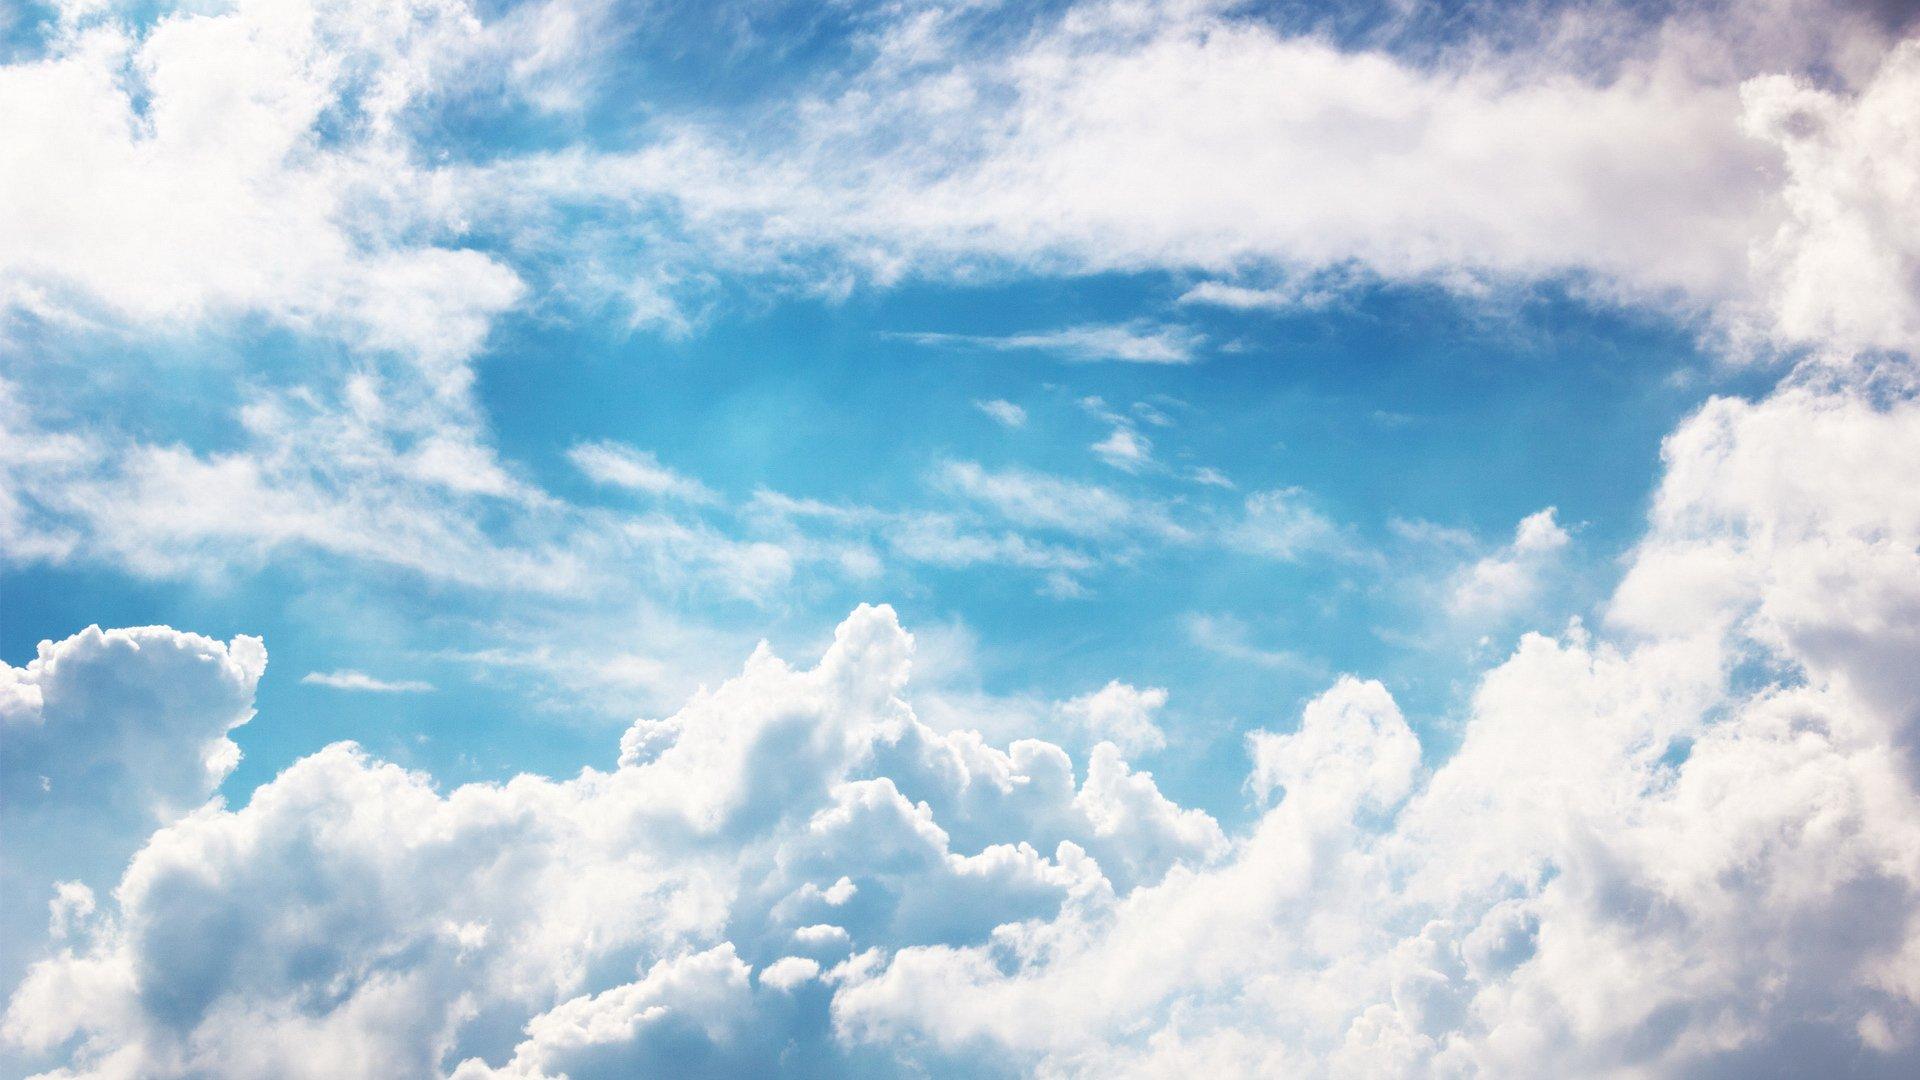 android安卓风景蓝天白云高清手机壁纸免费下载安心